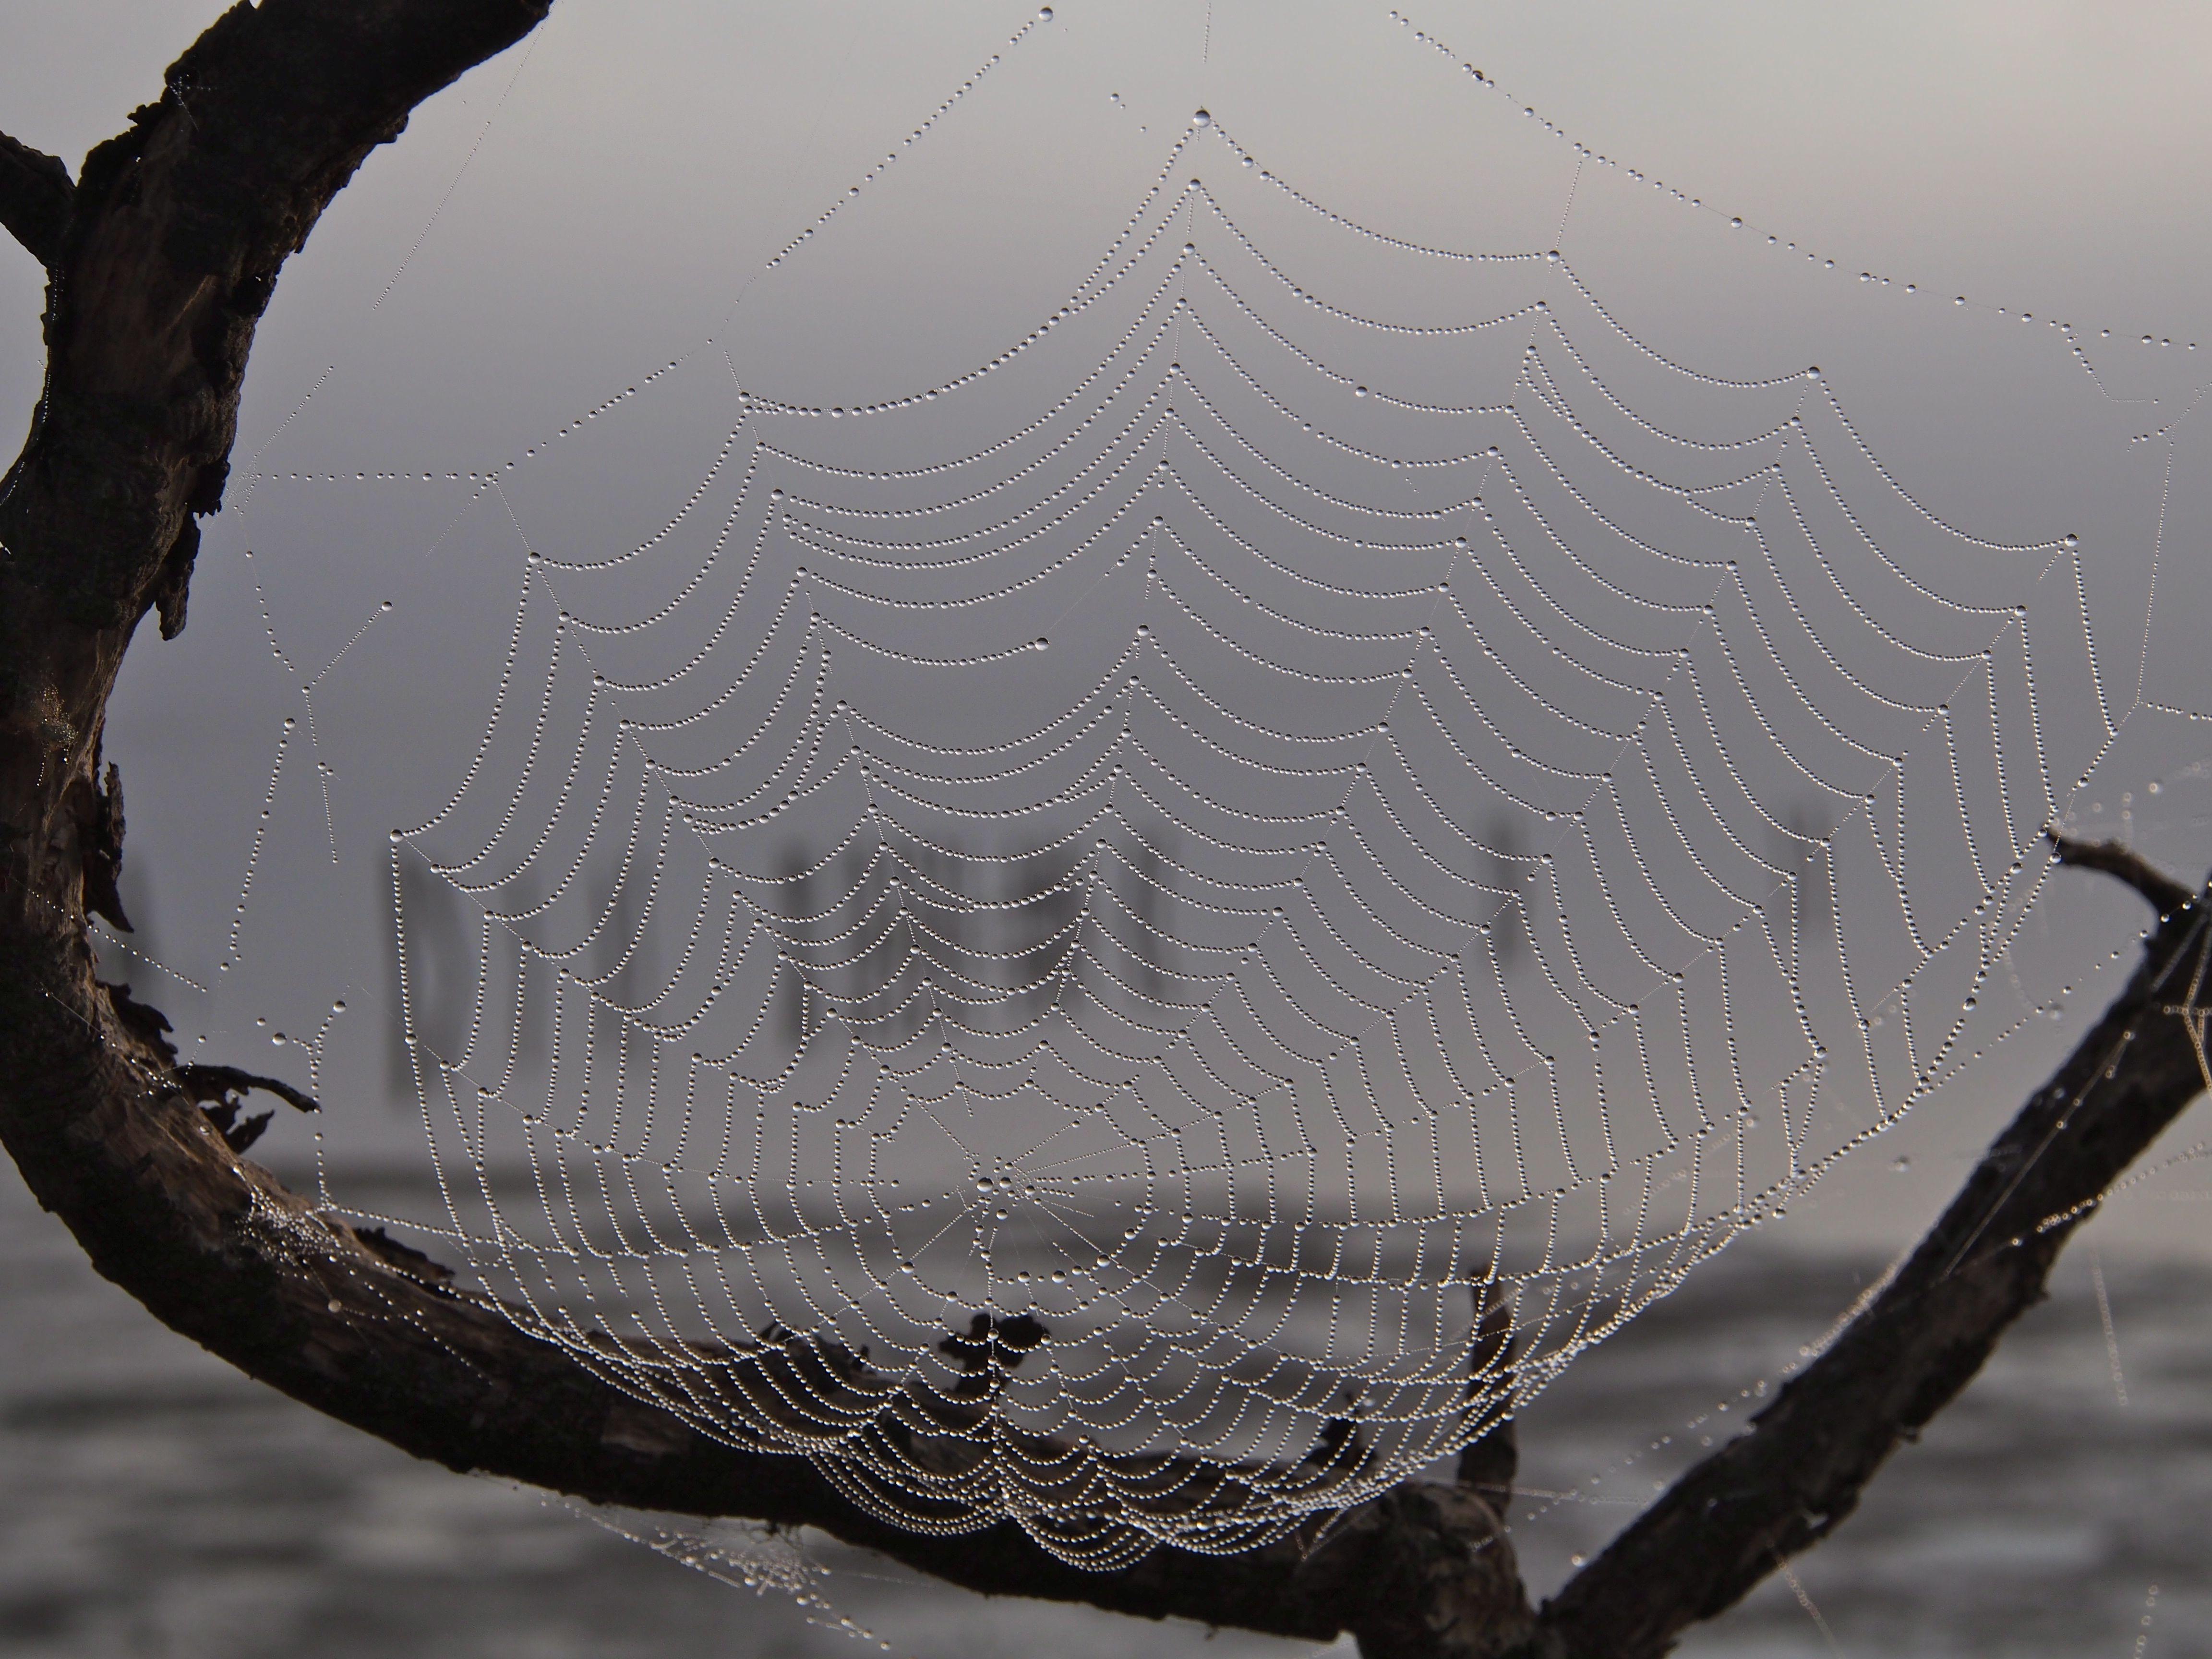 The spiderwebs were beautiful